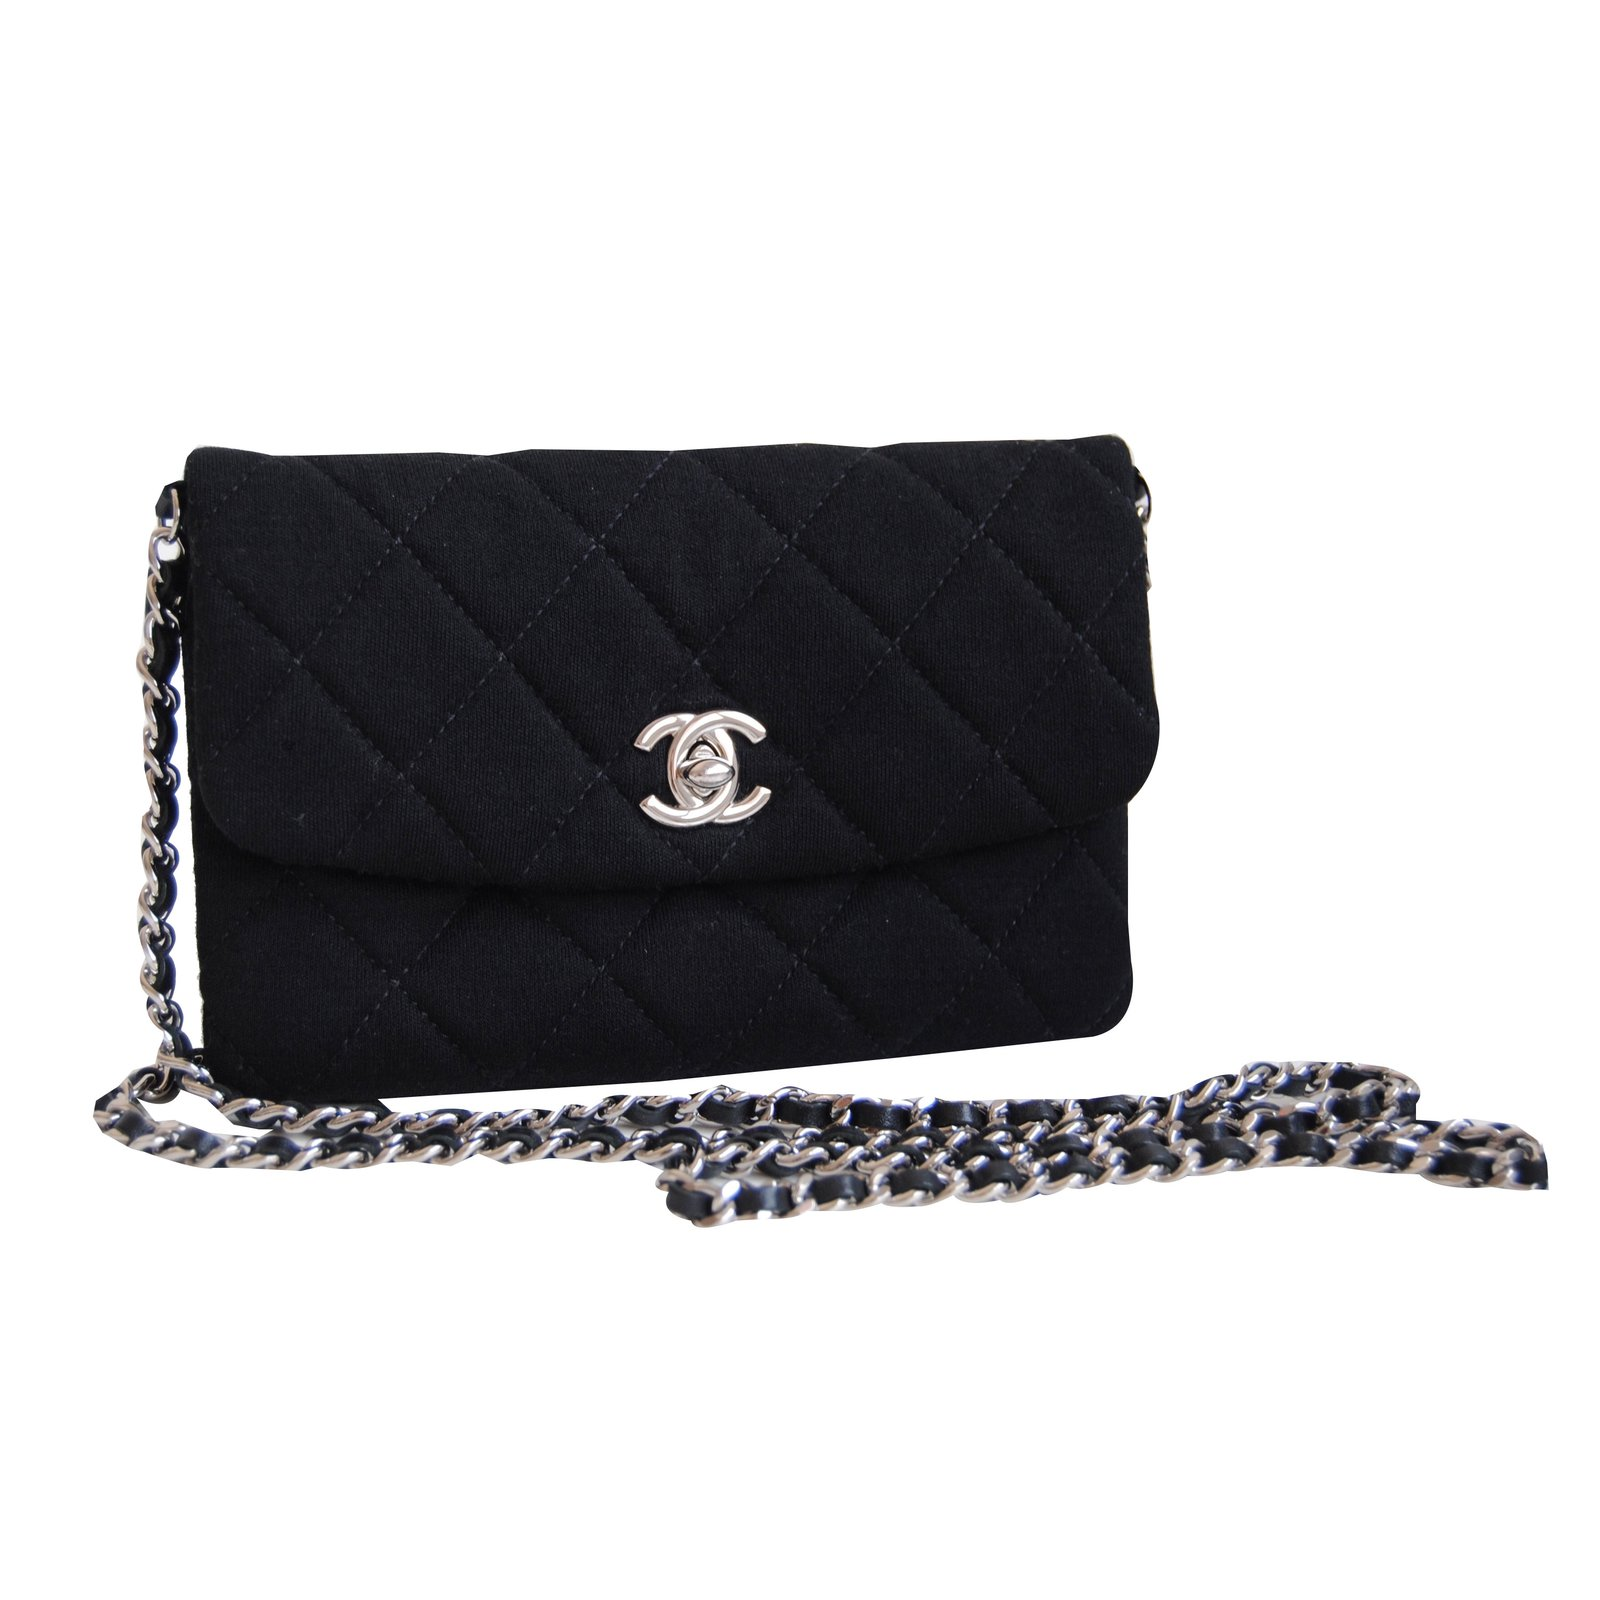 c7930d7581da Chanel Timeless flap mini chanel bag Handbags Other Black ref.36690 - Joli  Closet